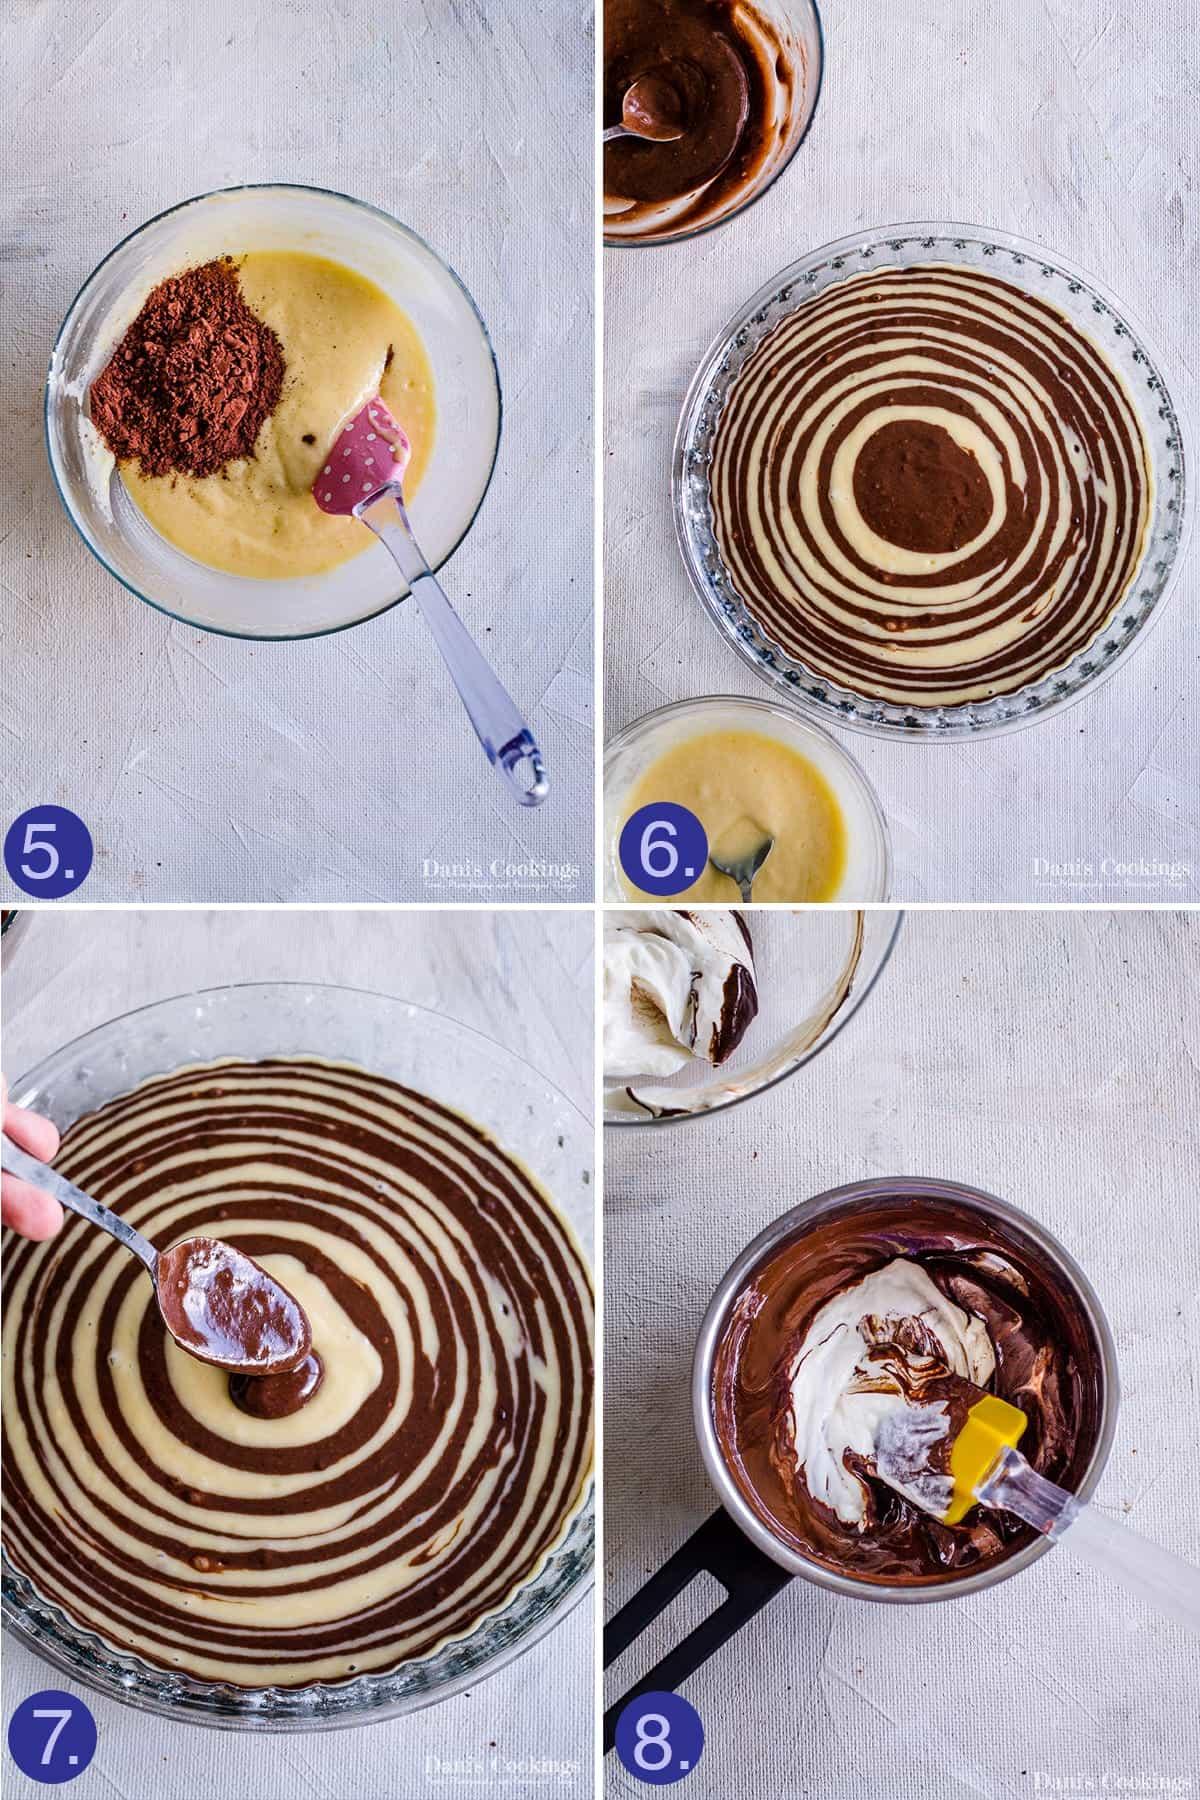 steps to make the stripes and the glaze